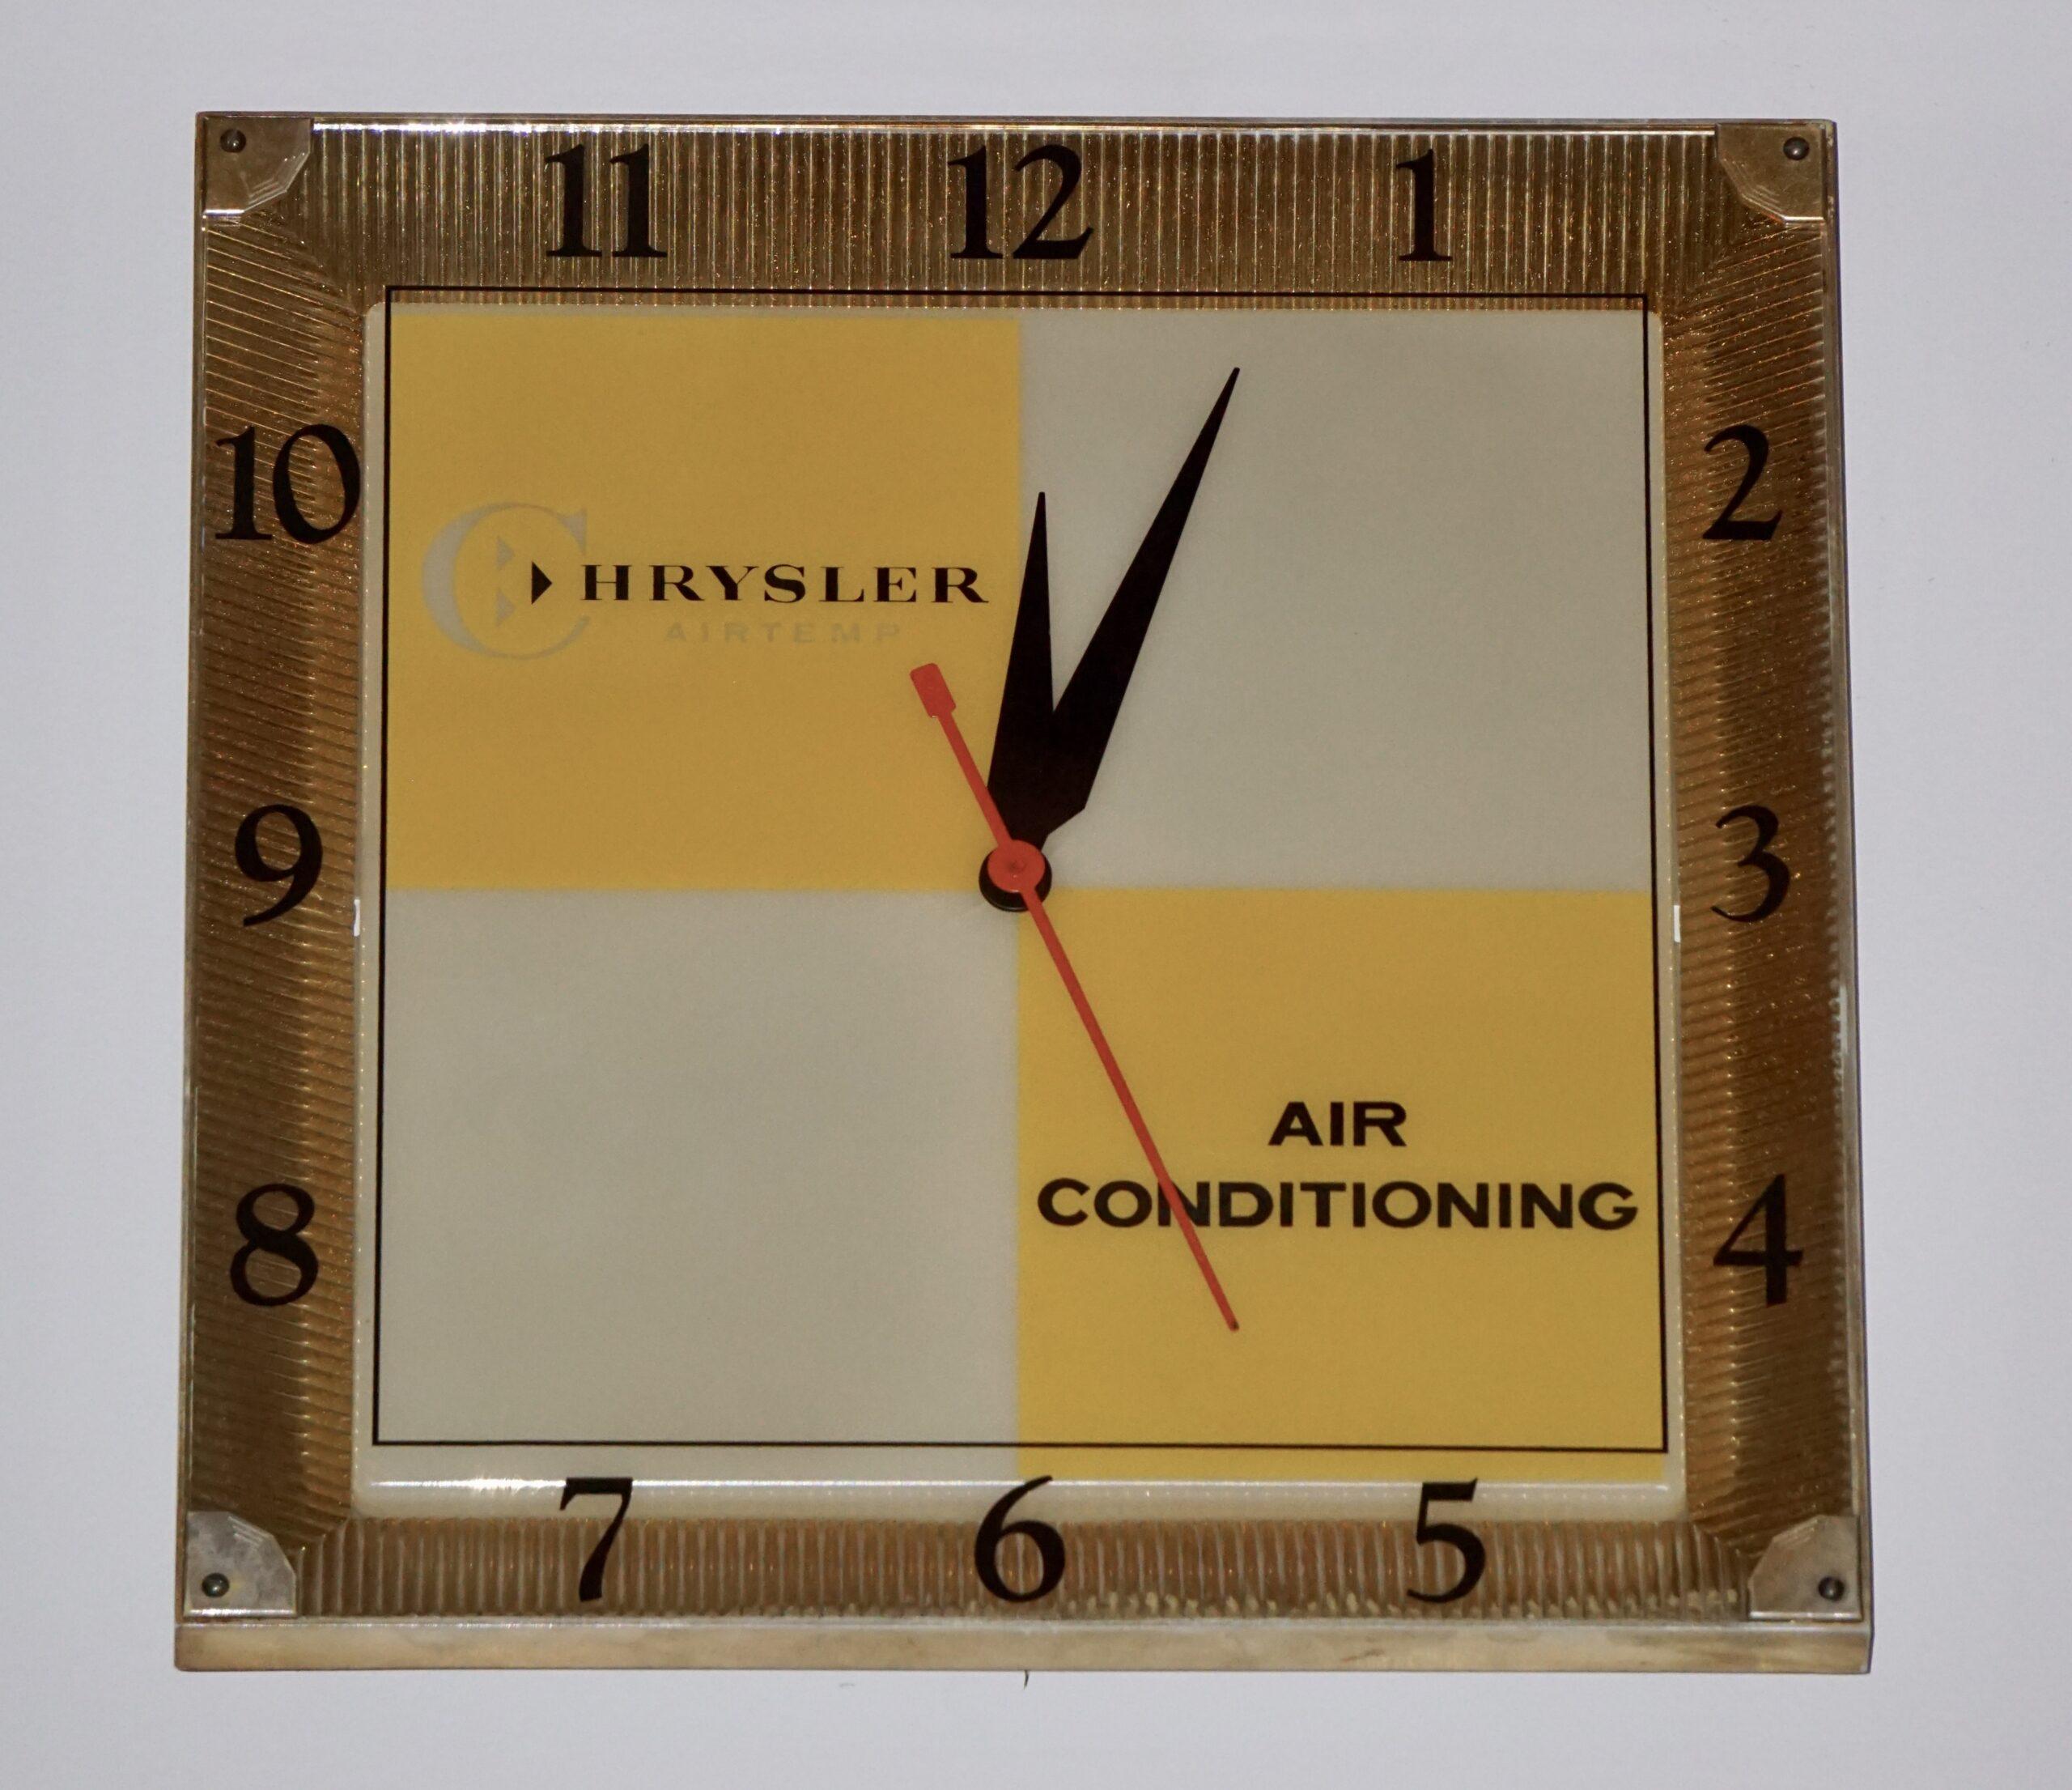 Chrysler Air Conditioning Clock